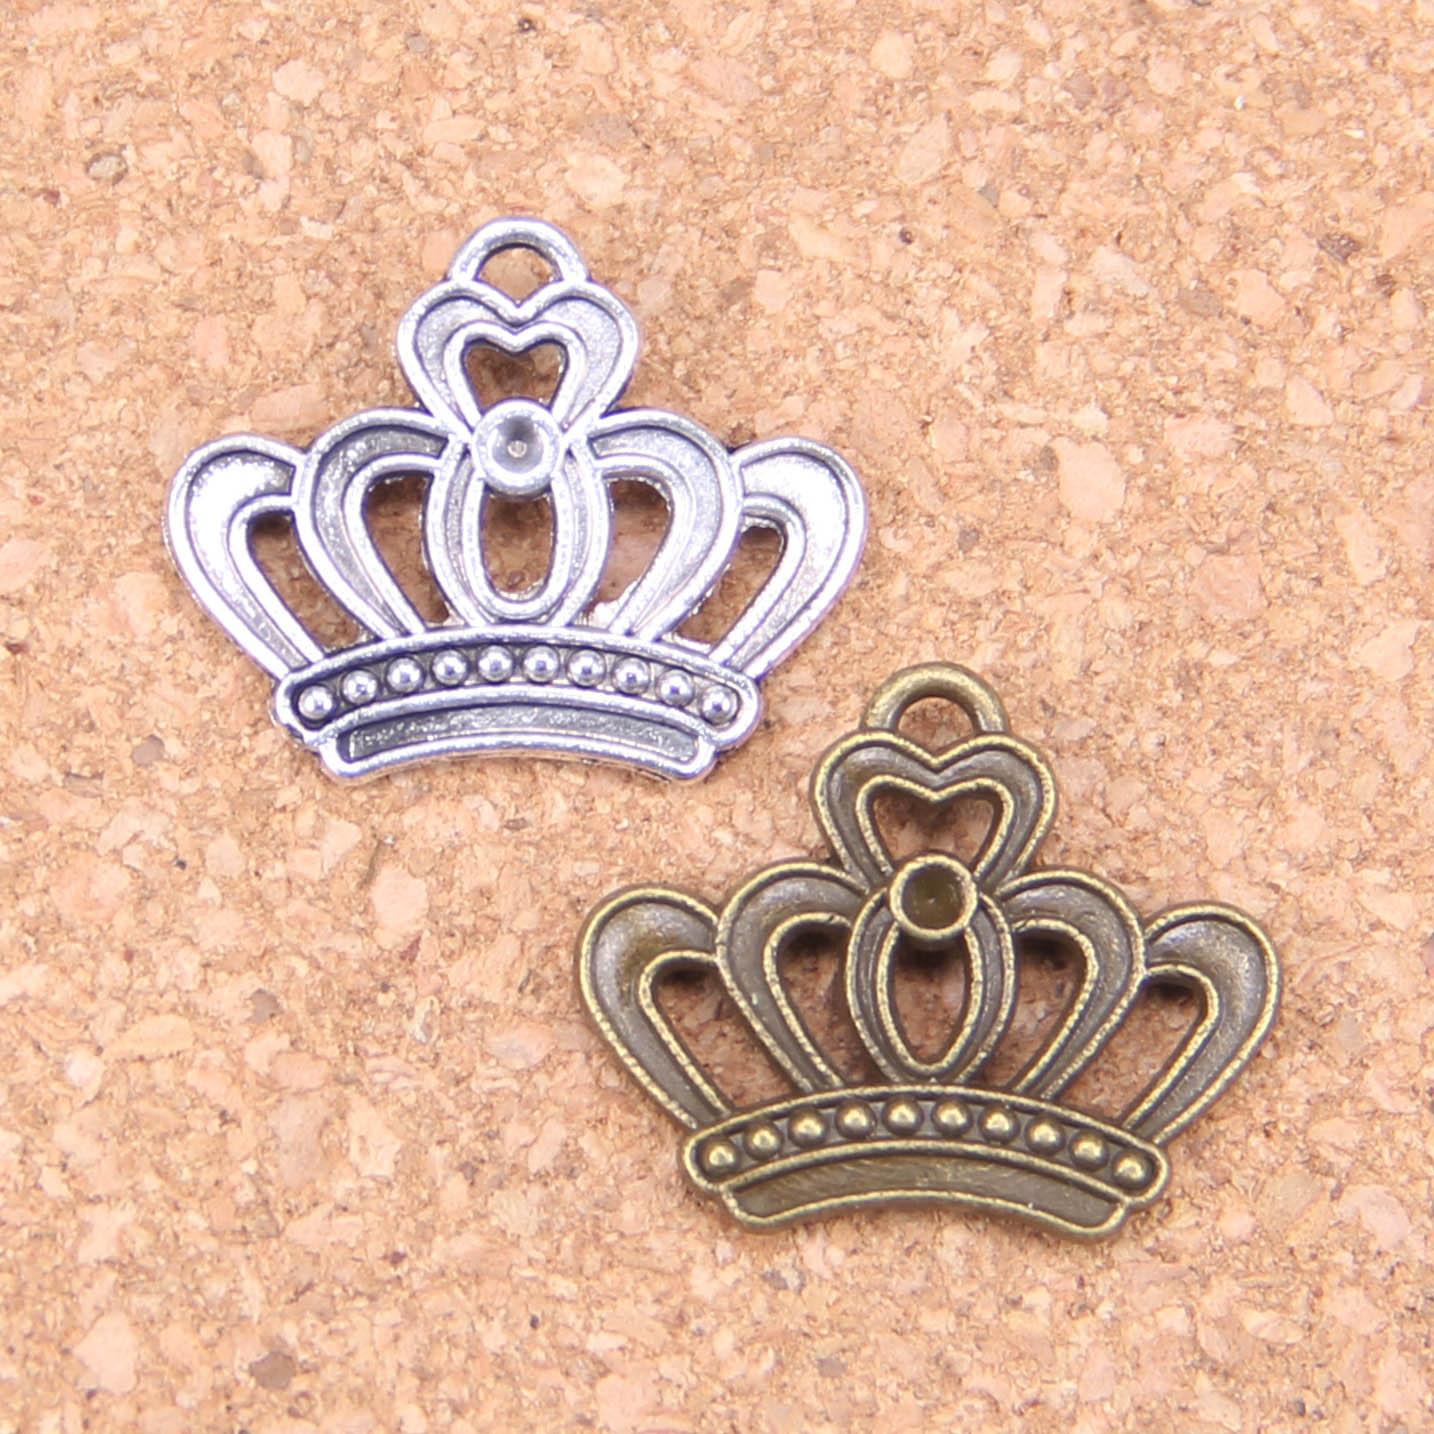 14pcs Encantos imperial coroa real 22x18mm Antique Pingentes, Vintage Jóias De Prata Tibetano, DIY para colar pulseira